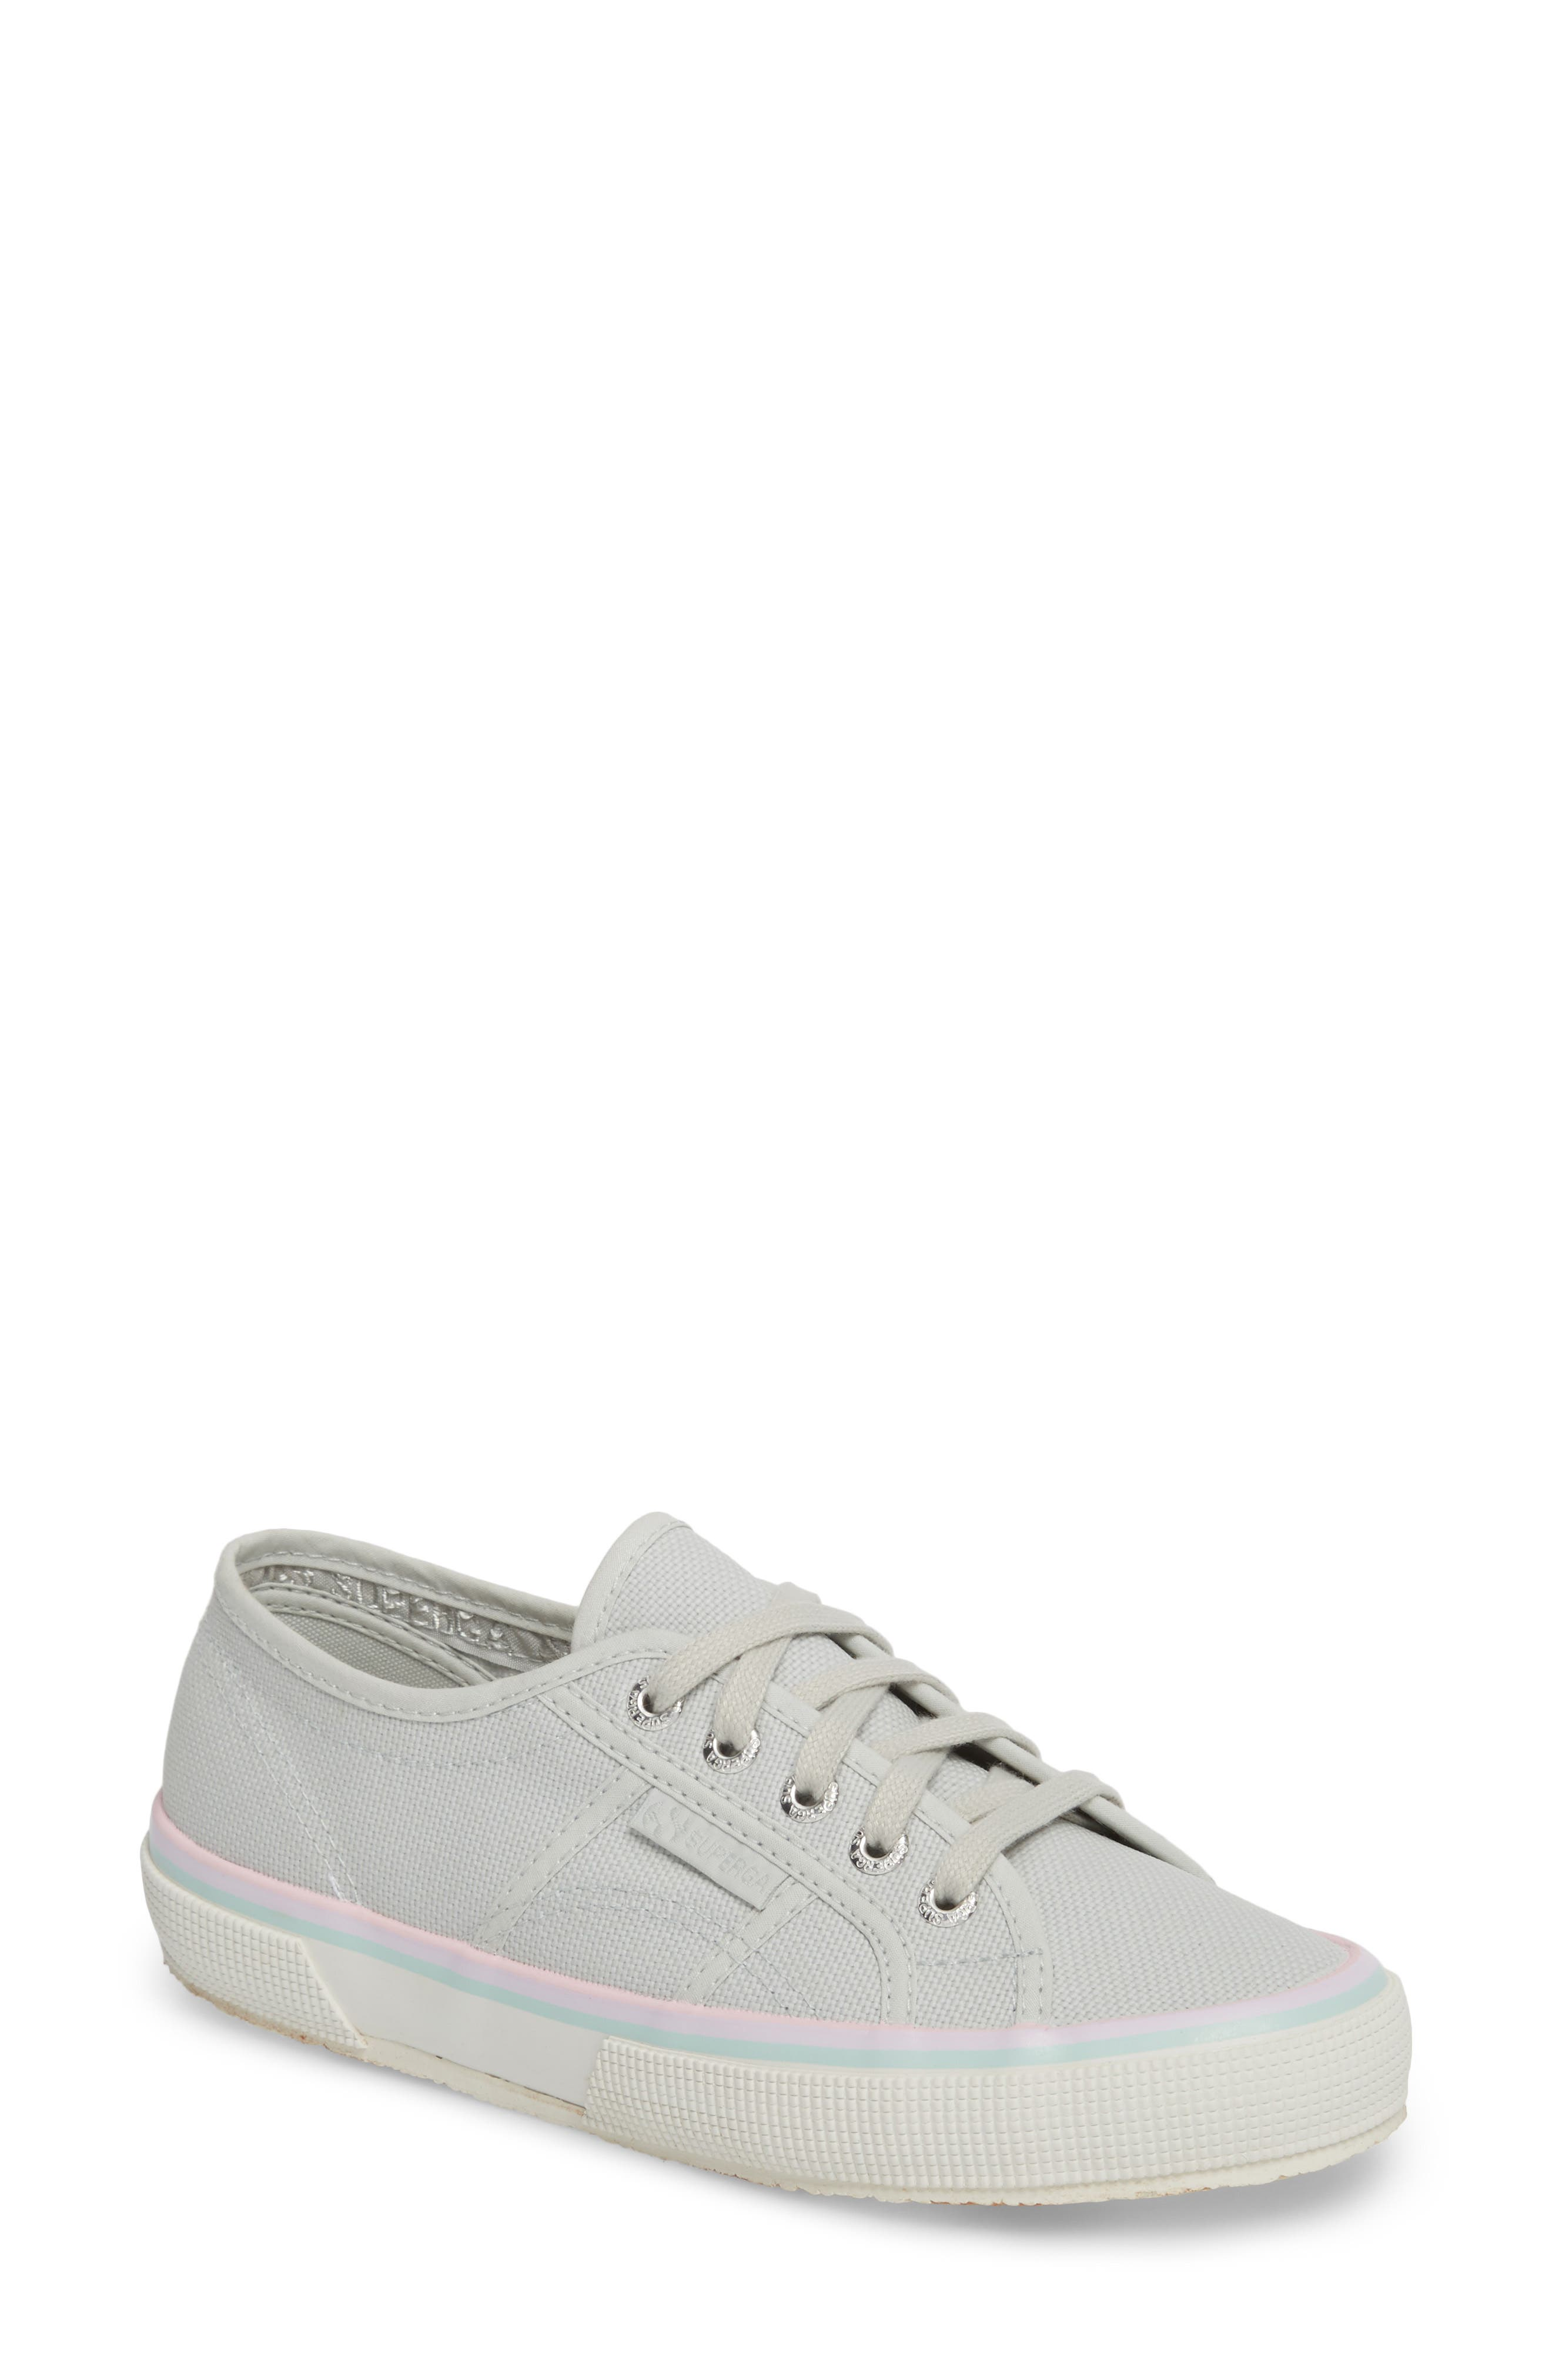 2750 Three-Stripe Sneaker,                             Main thumbnail 1, color,                             020